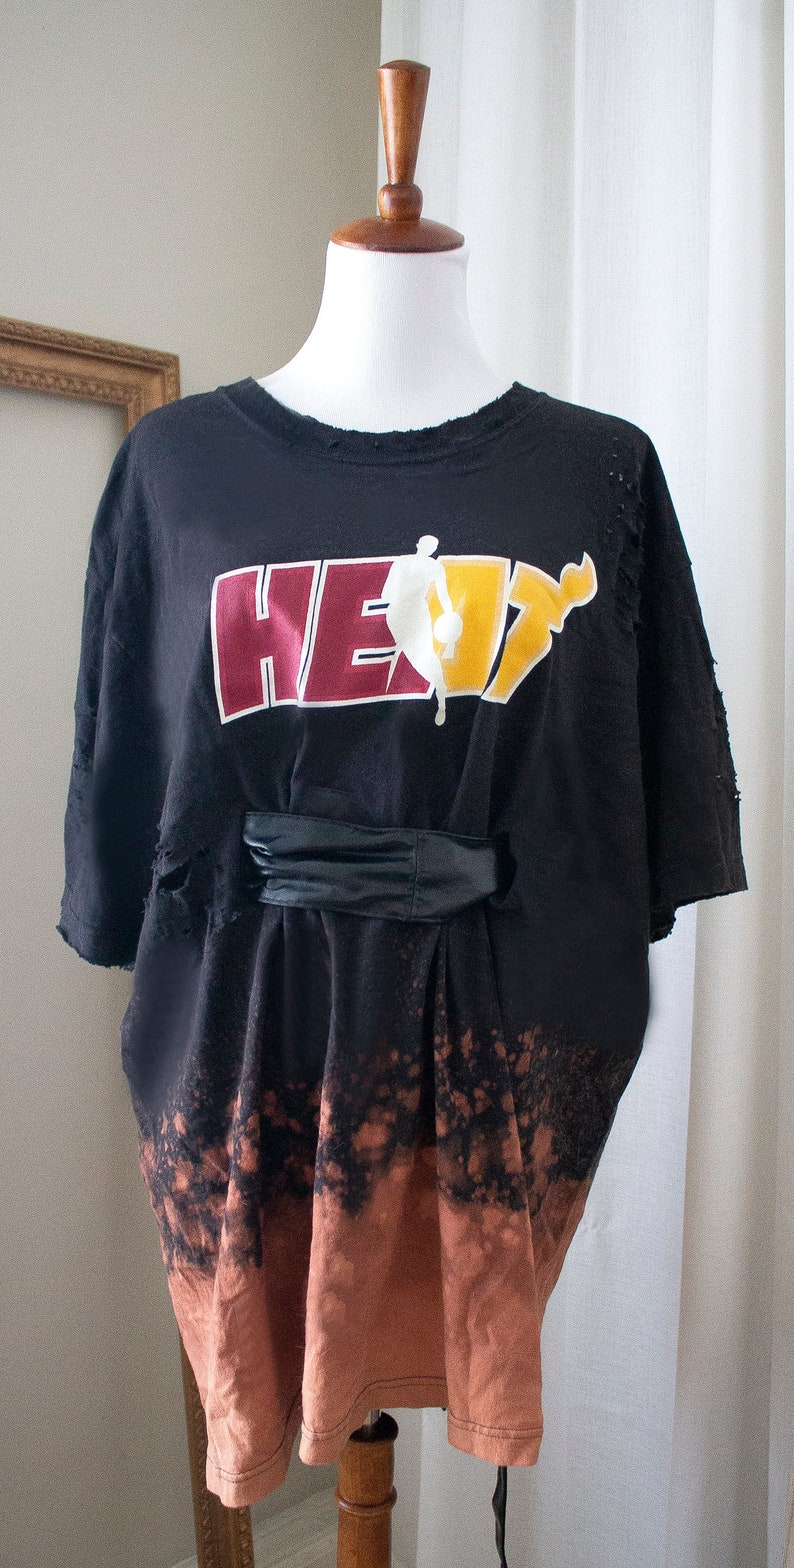 Miami Heat Women's Dresses